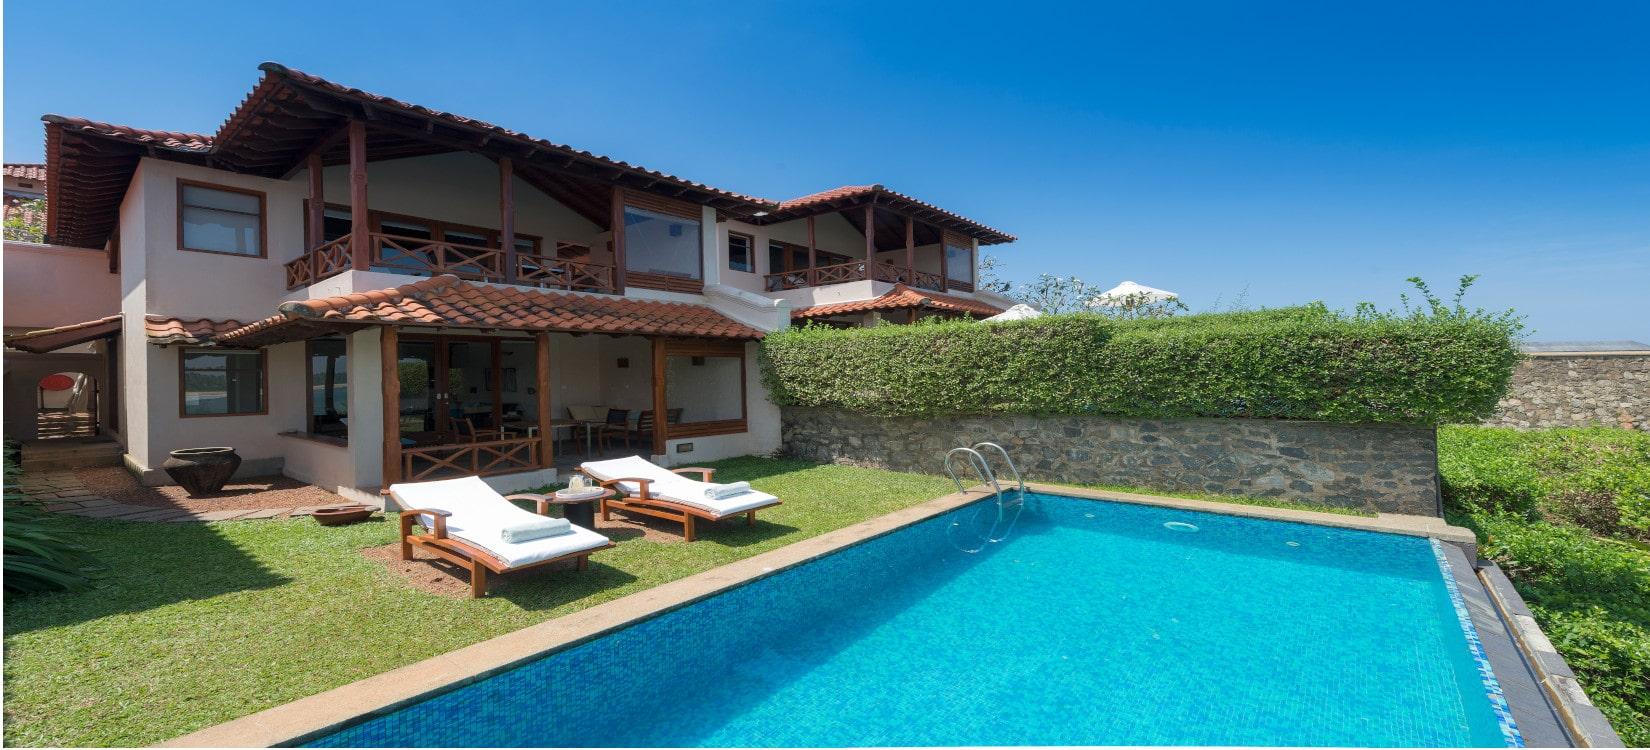 villa with pool srilanka-min